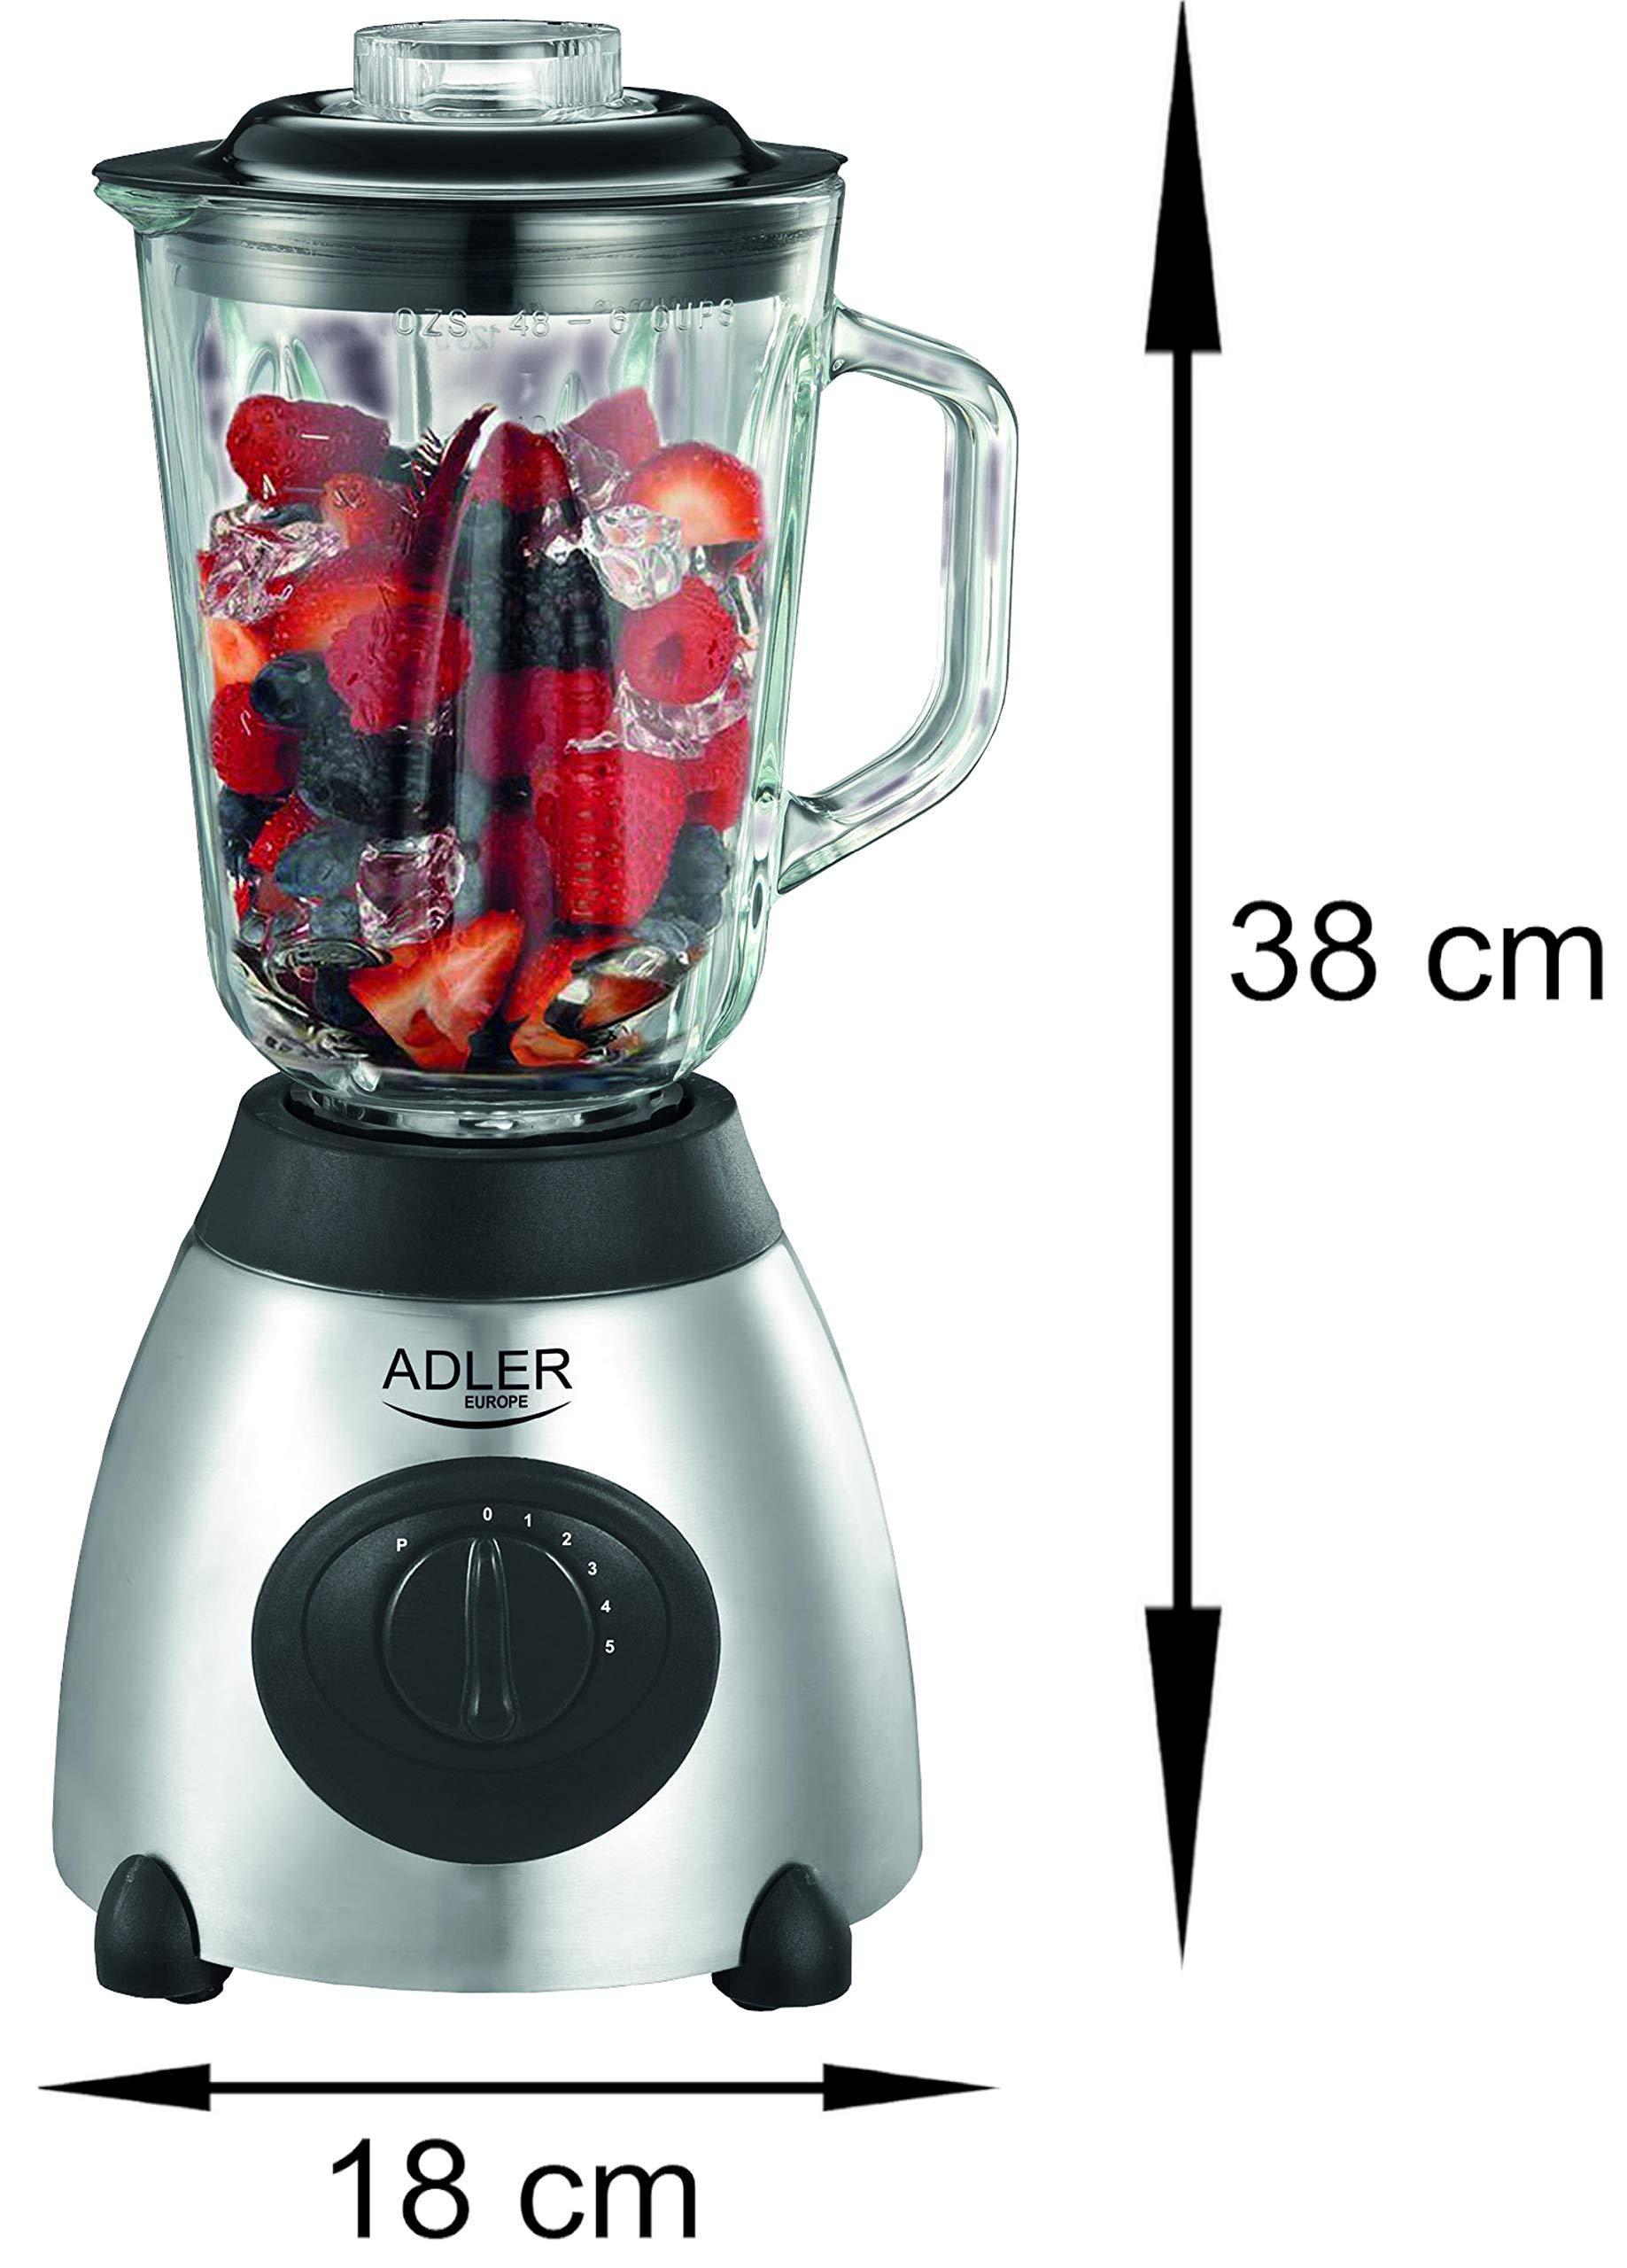 Standmixer-800-Watt-Glas-Edelstahl-15-Liter-6-Fach-Metallmesser-Universal-Power-Mixer-Smoothie-Maker-Mixer-Zerkleinerer-Eiwei-Shaker-Ice-Crusher